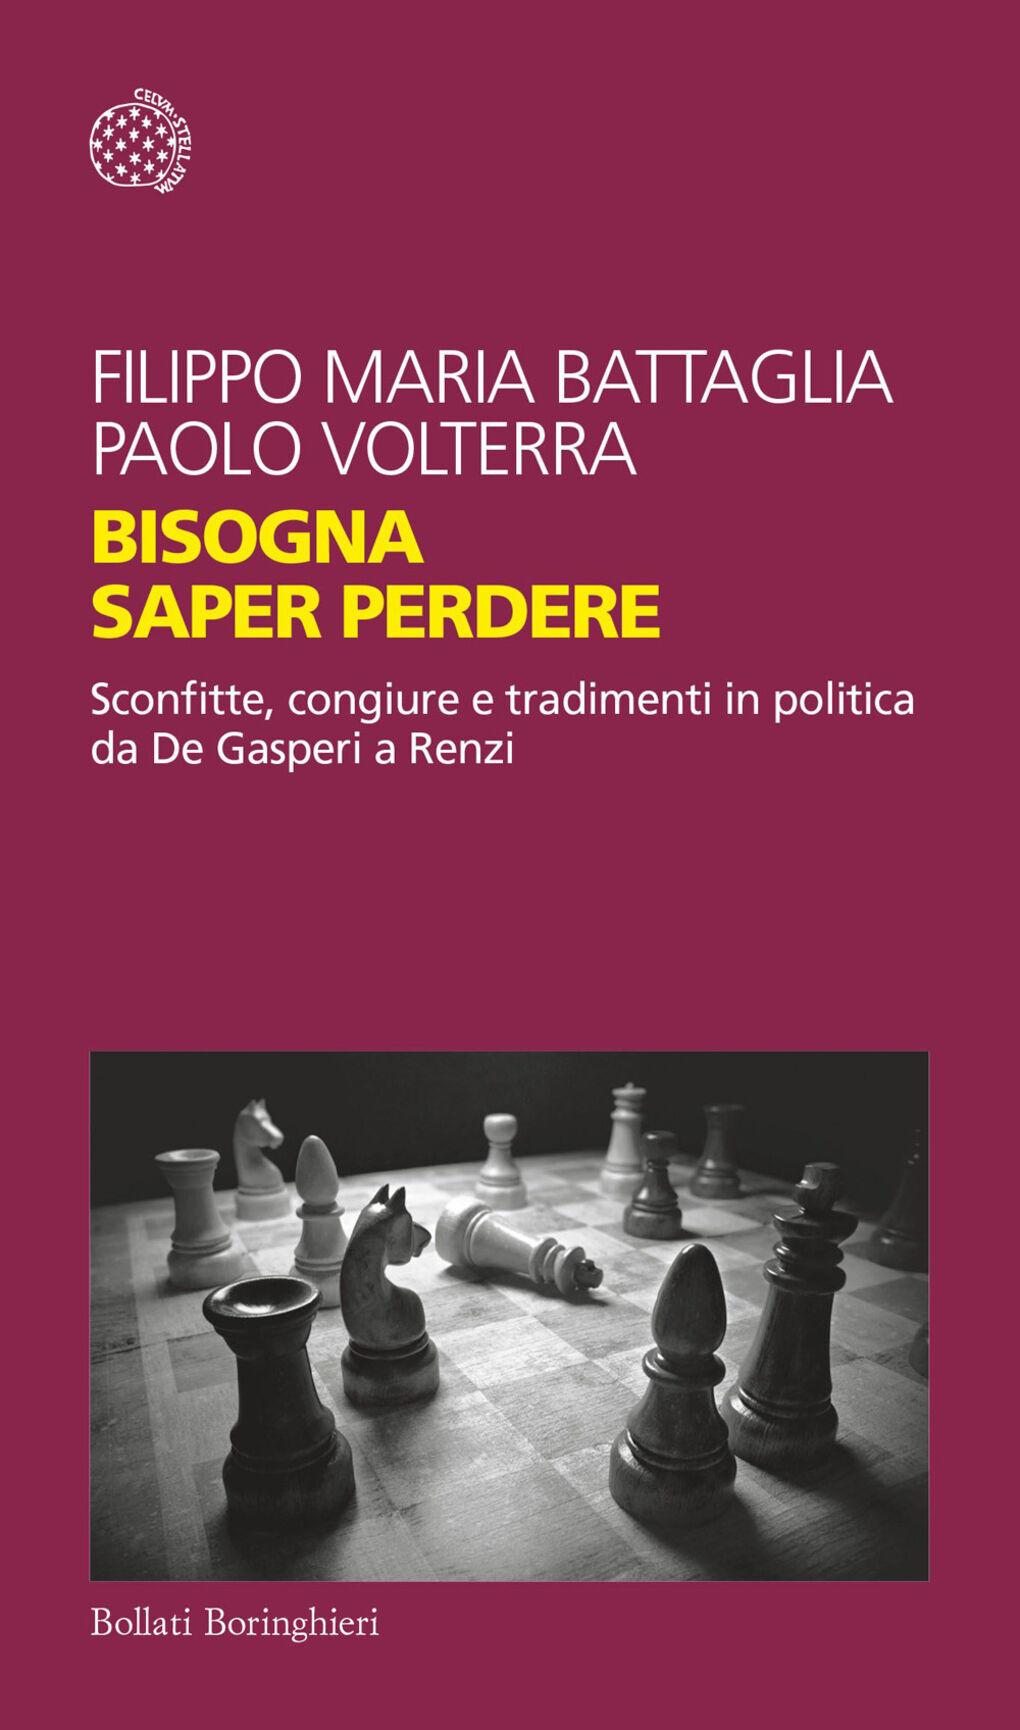 Bisogna saper perdere. Sconfitte, congiure e tradimenti in politica da De Gasperi a Renzi